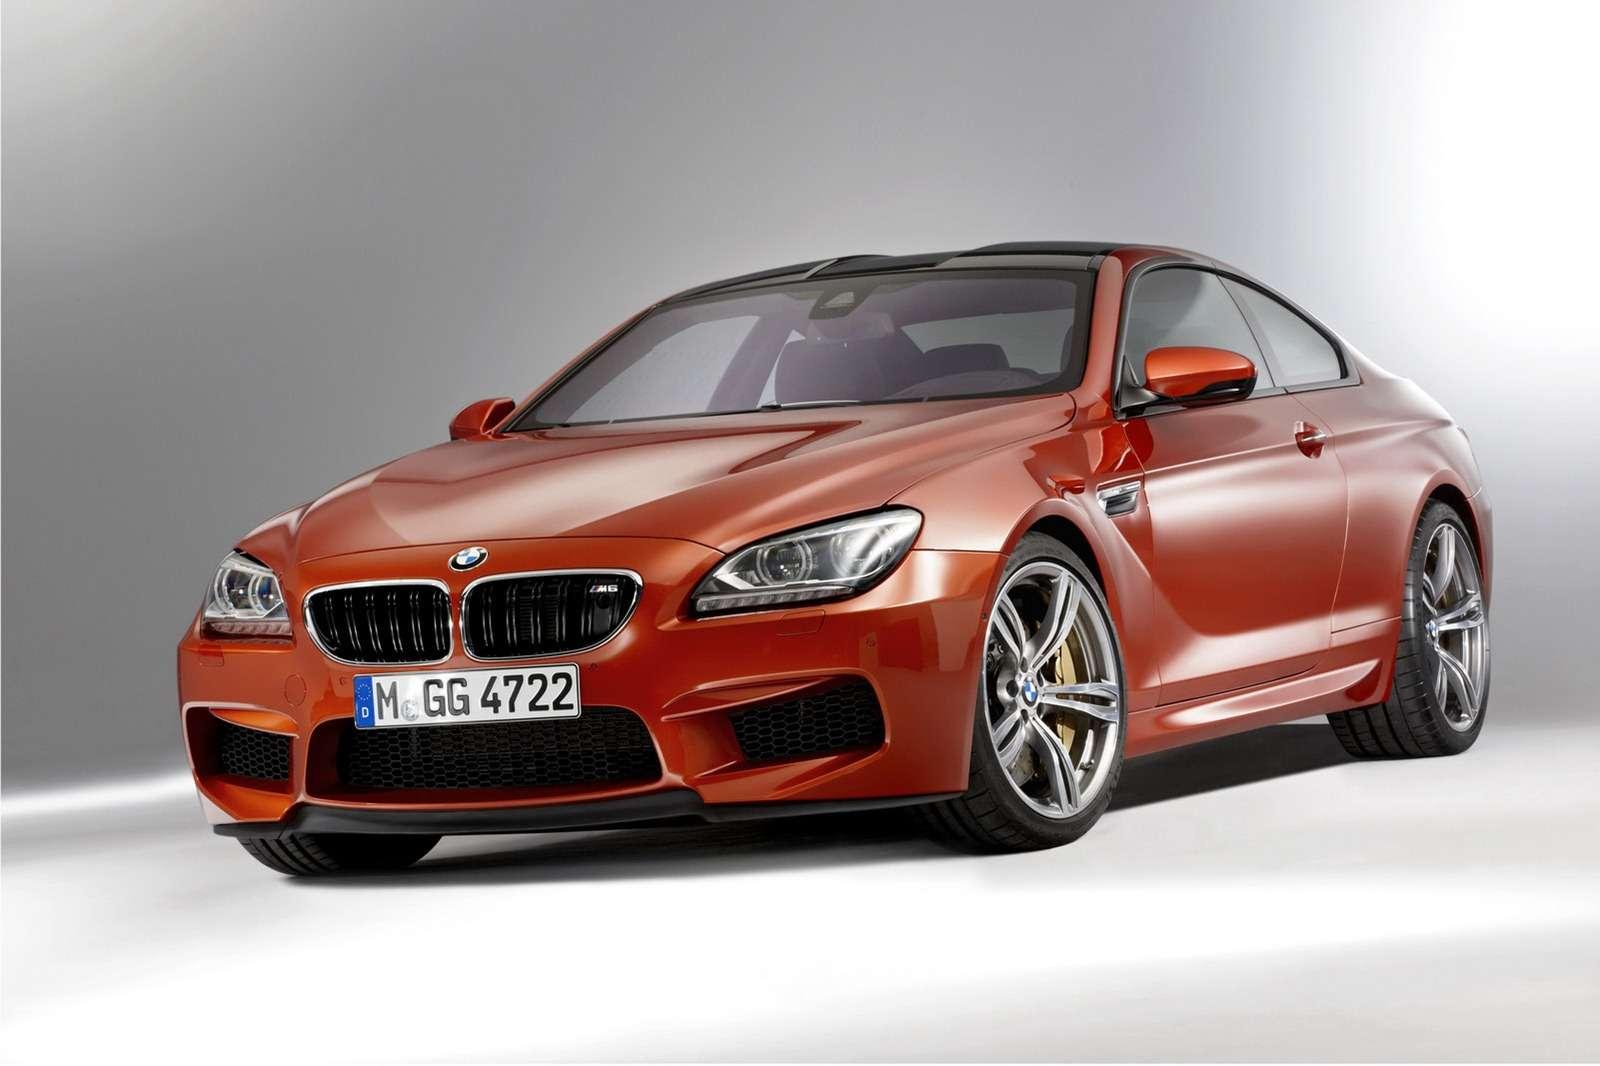 2013 M6 Coupe i cabrio zdjecia luty 2012